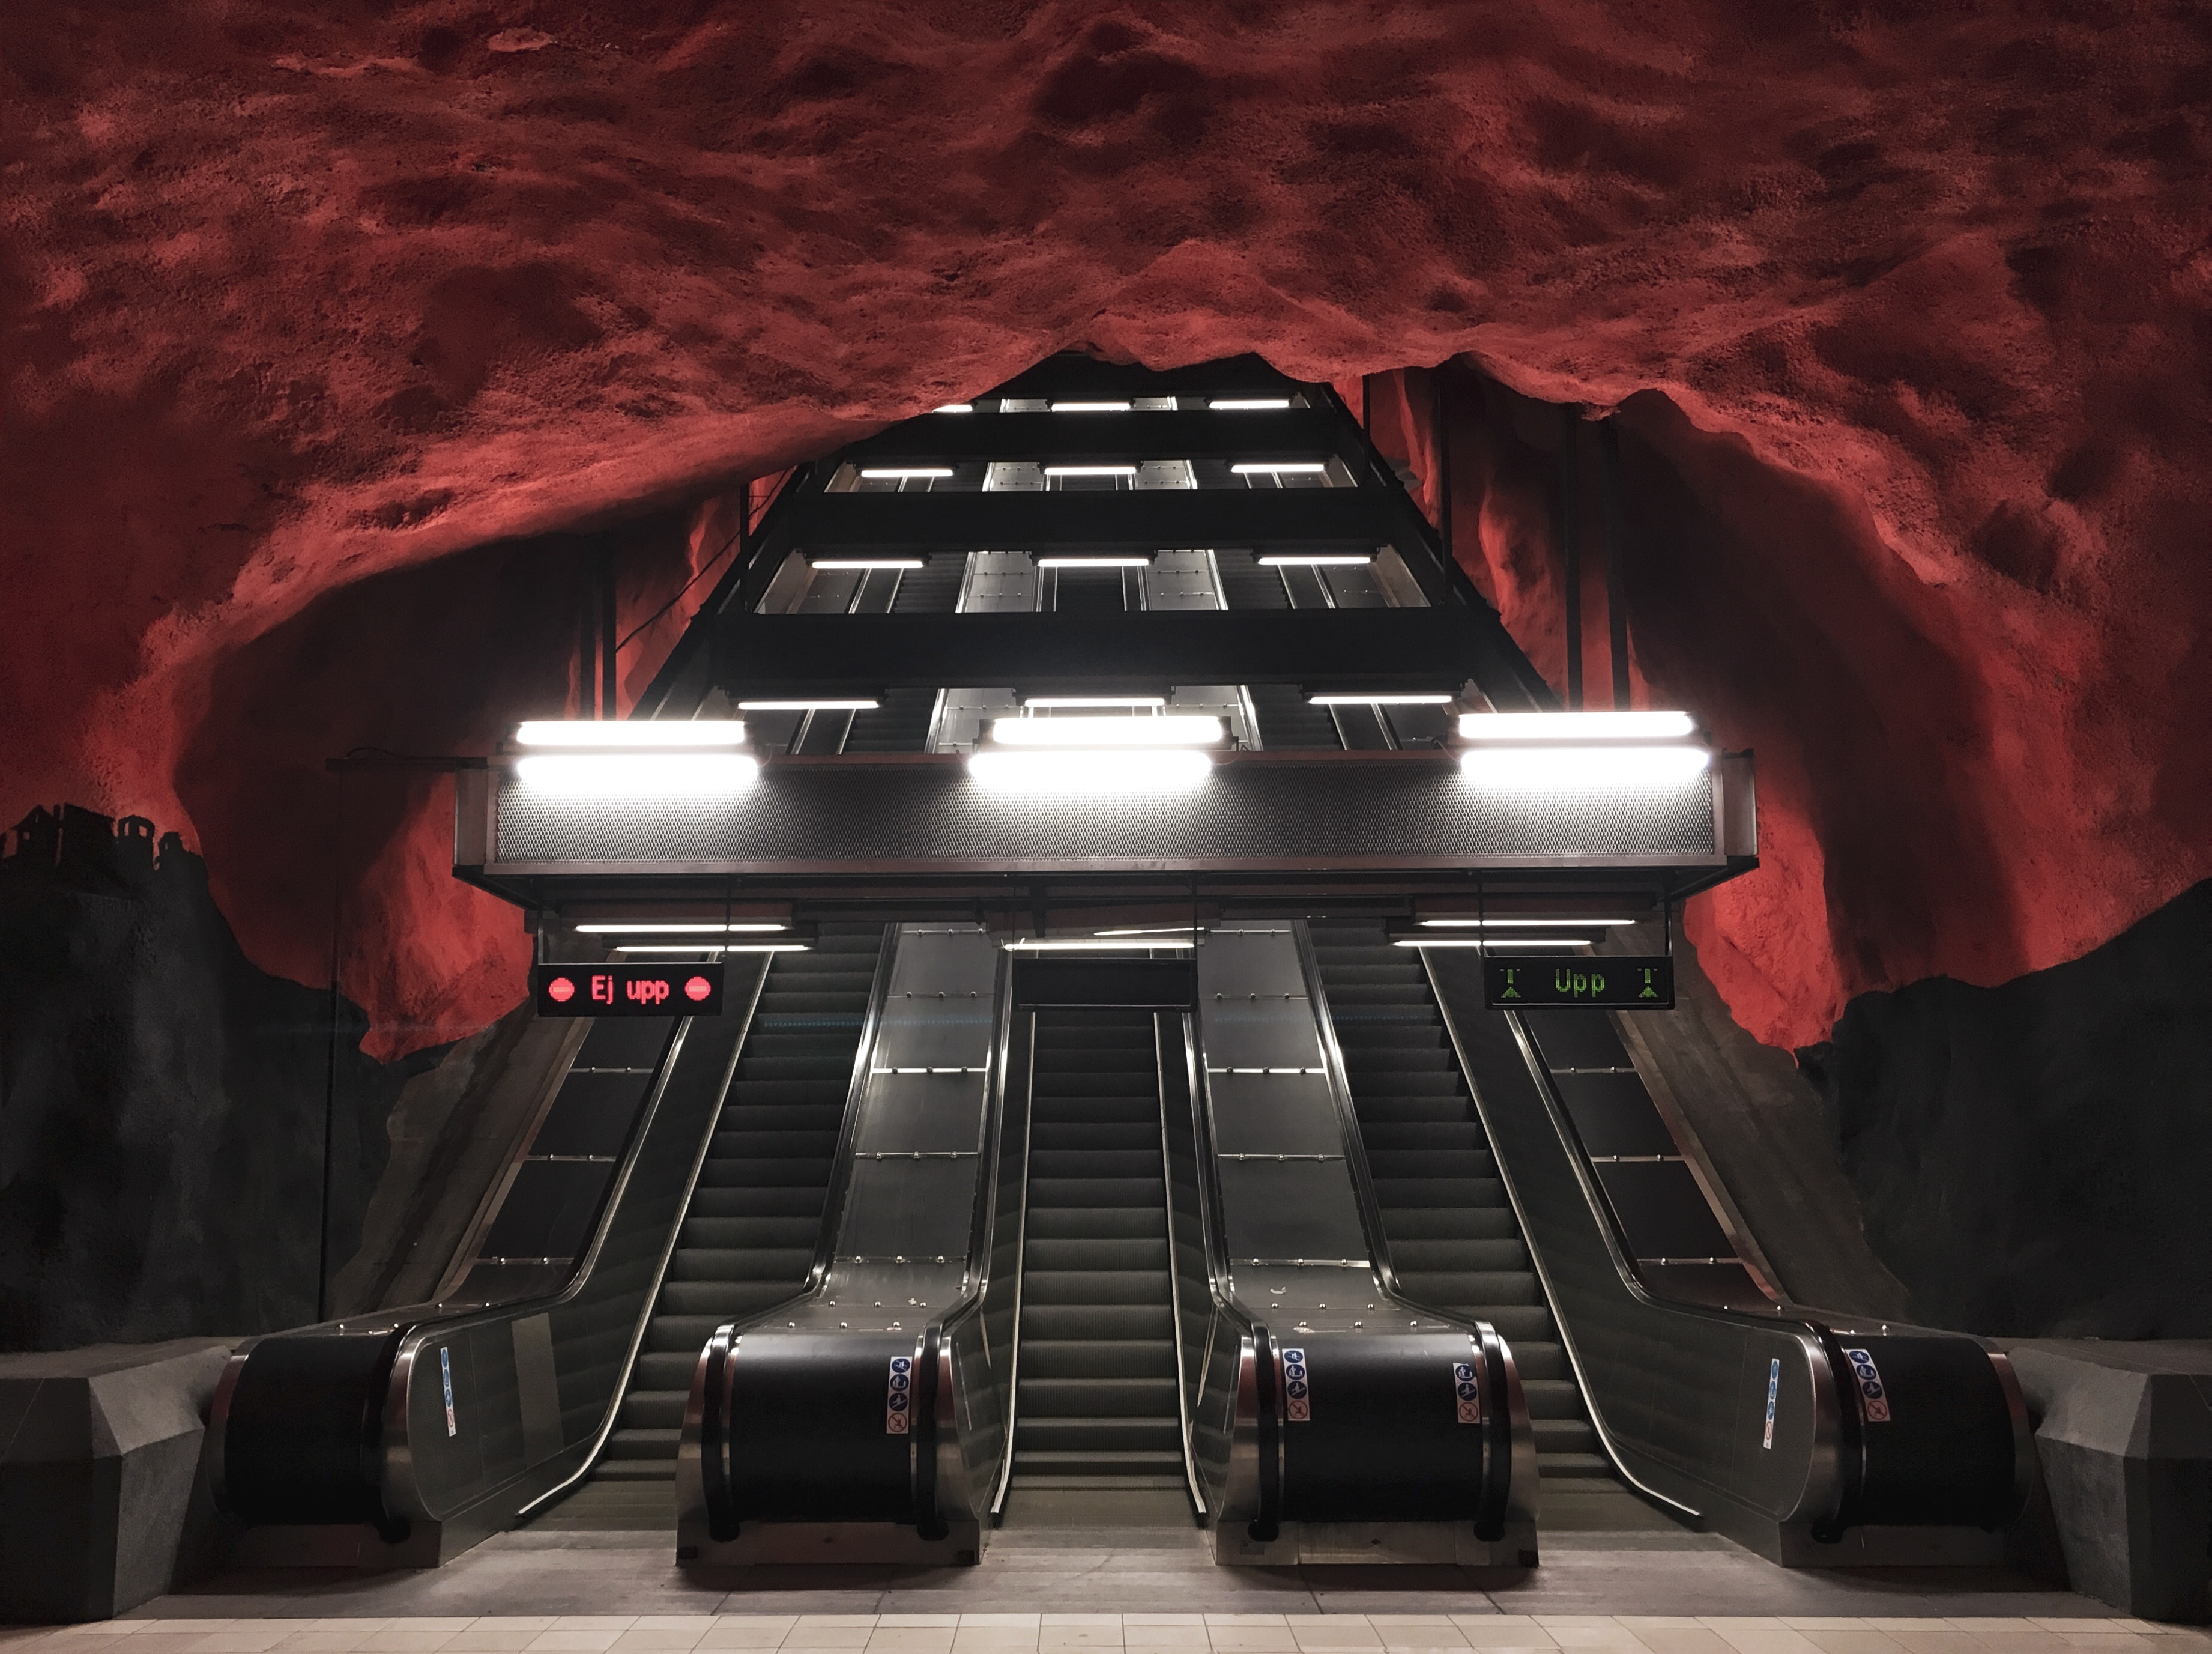 three black escalators inside red and black room